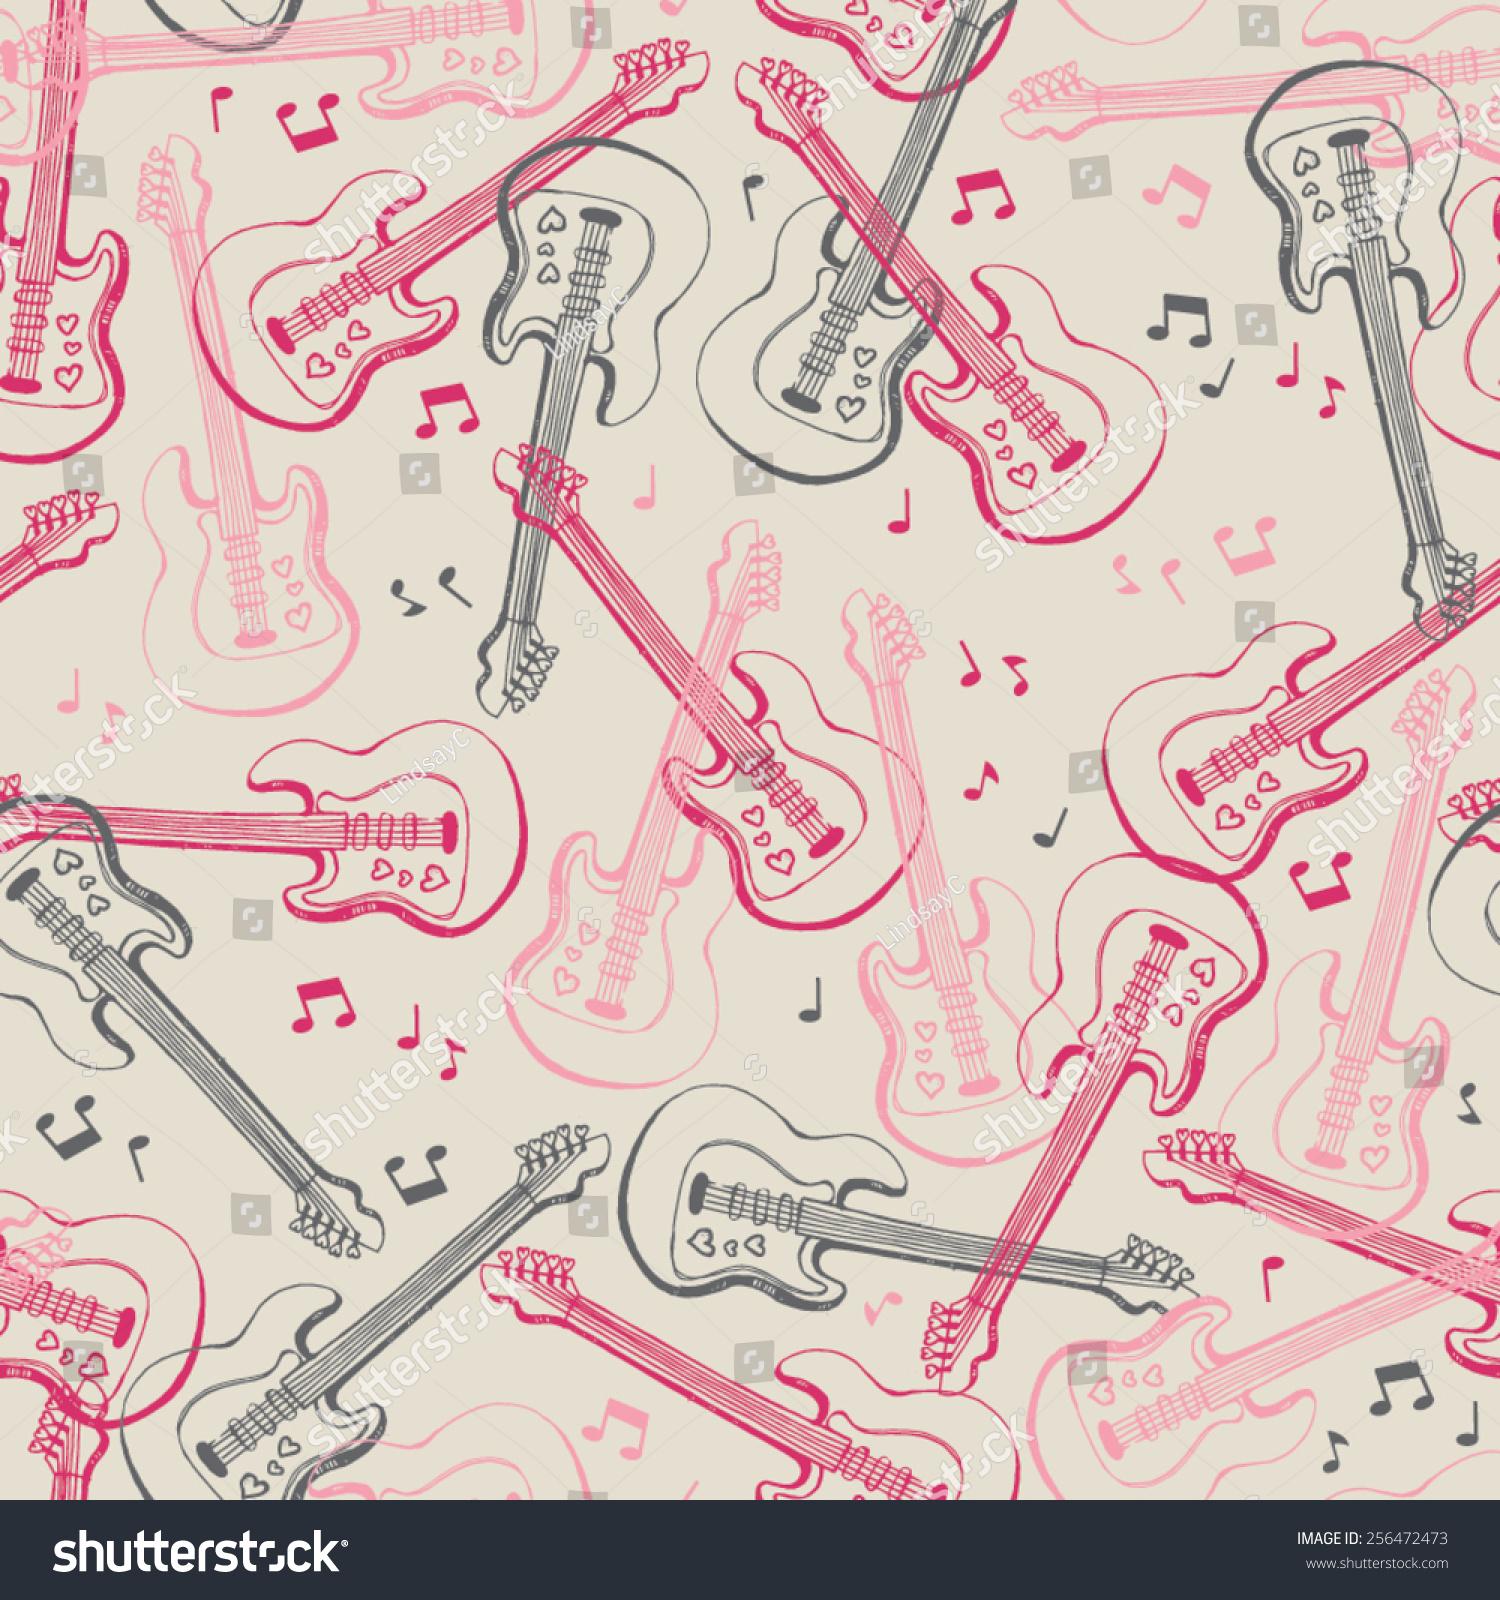 Love Rock Roll Seamless Repeat Wallpaper Stock Vector Royalty